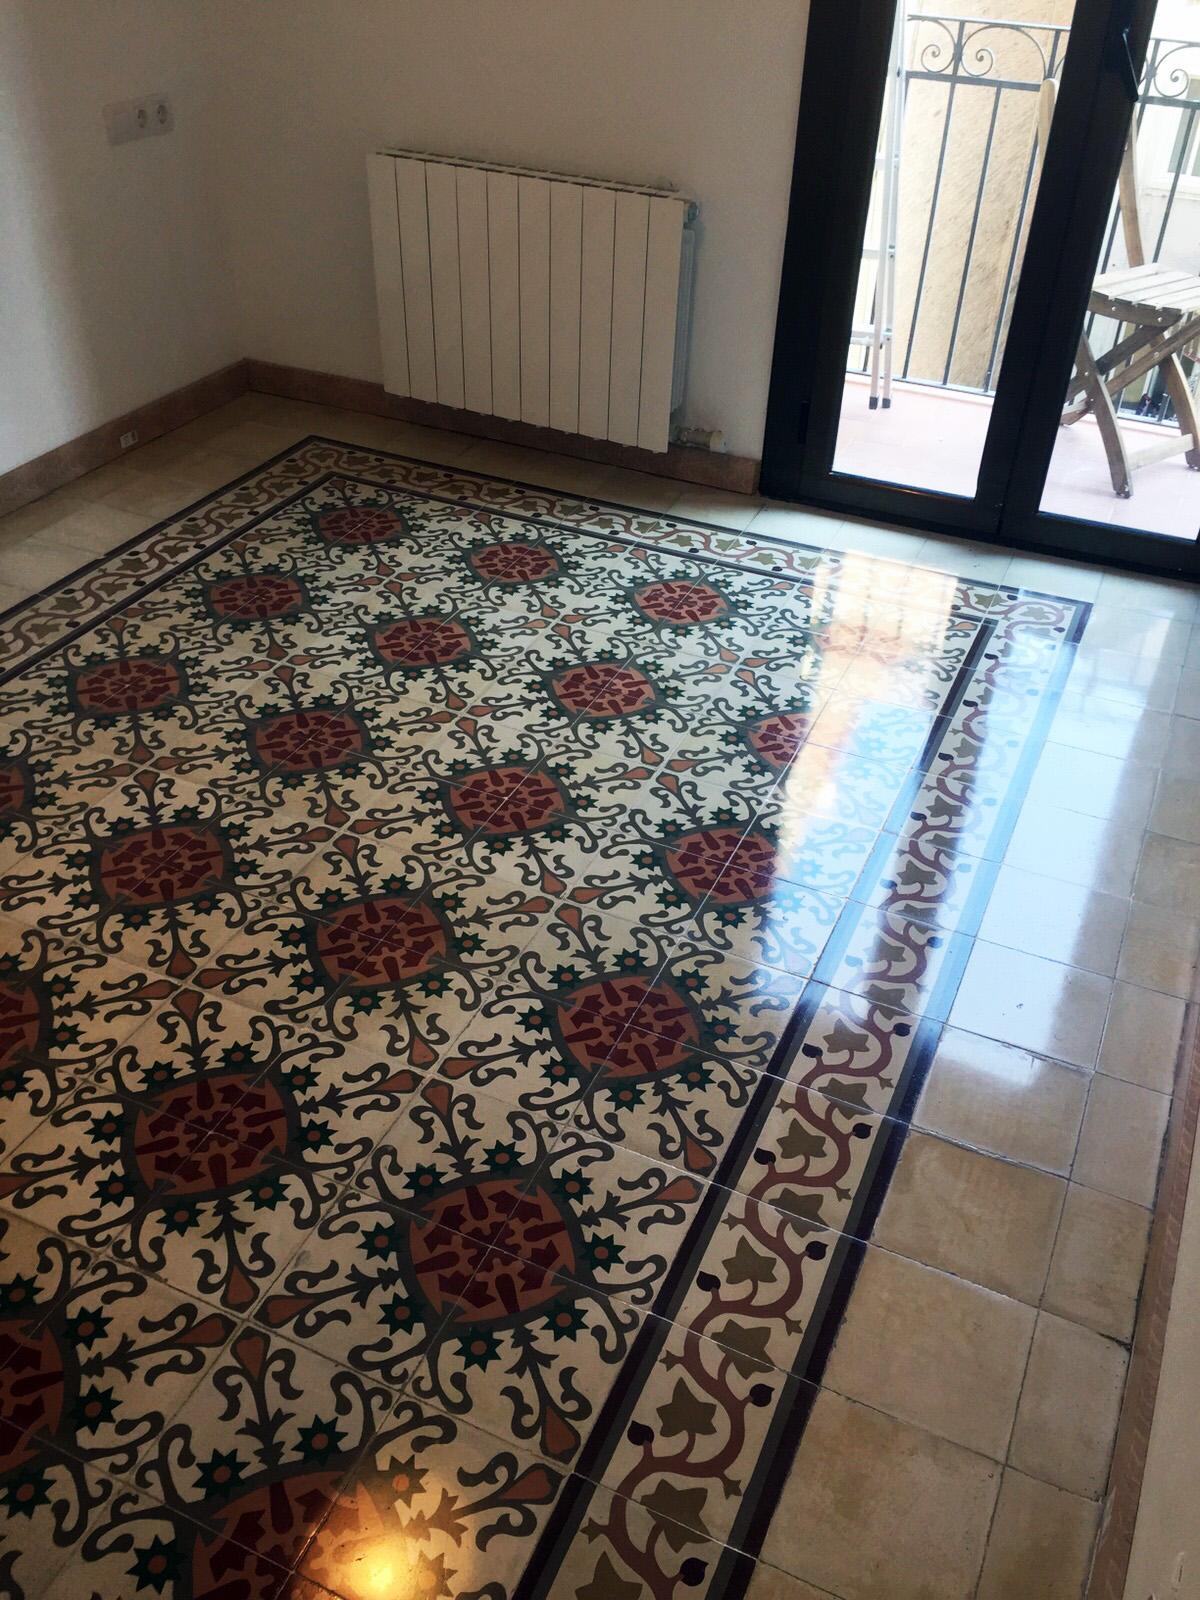 Rehabilitación e  impermeabilización de suelo de Baldosa Hidráulica en piso de  Barcelona. |